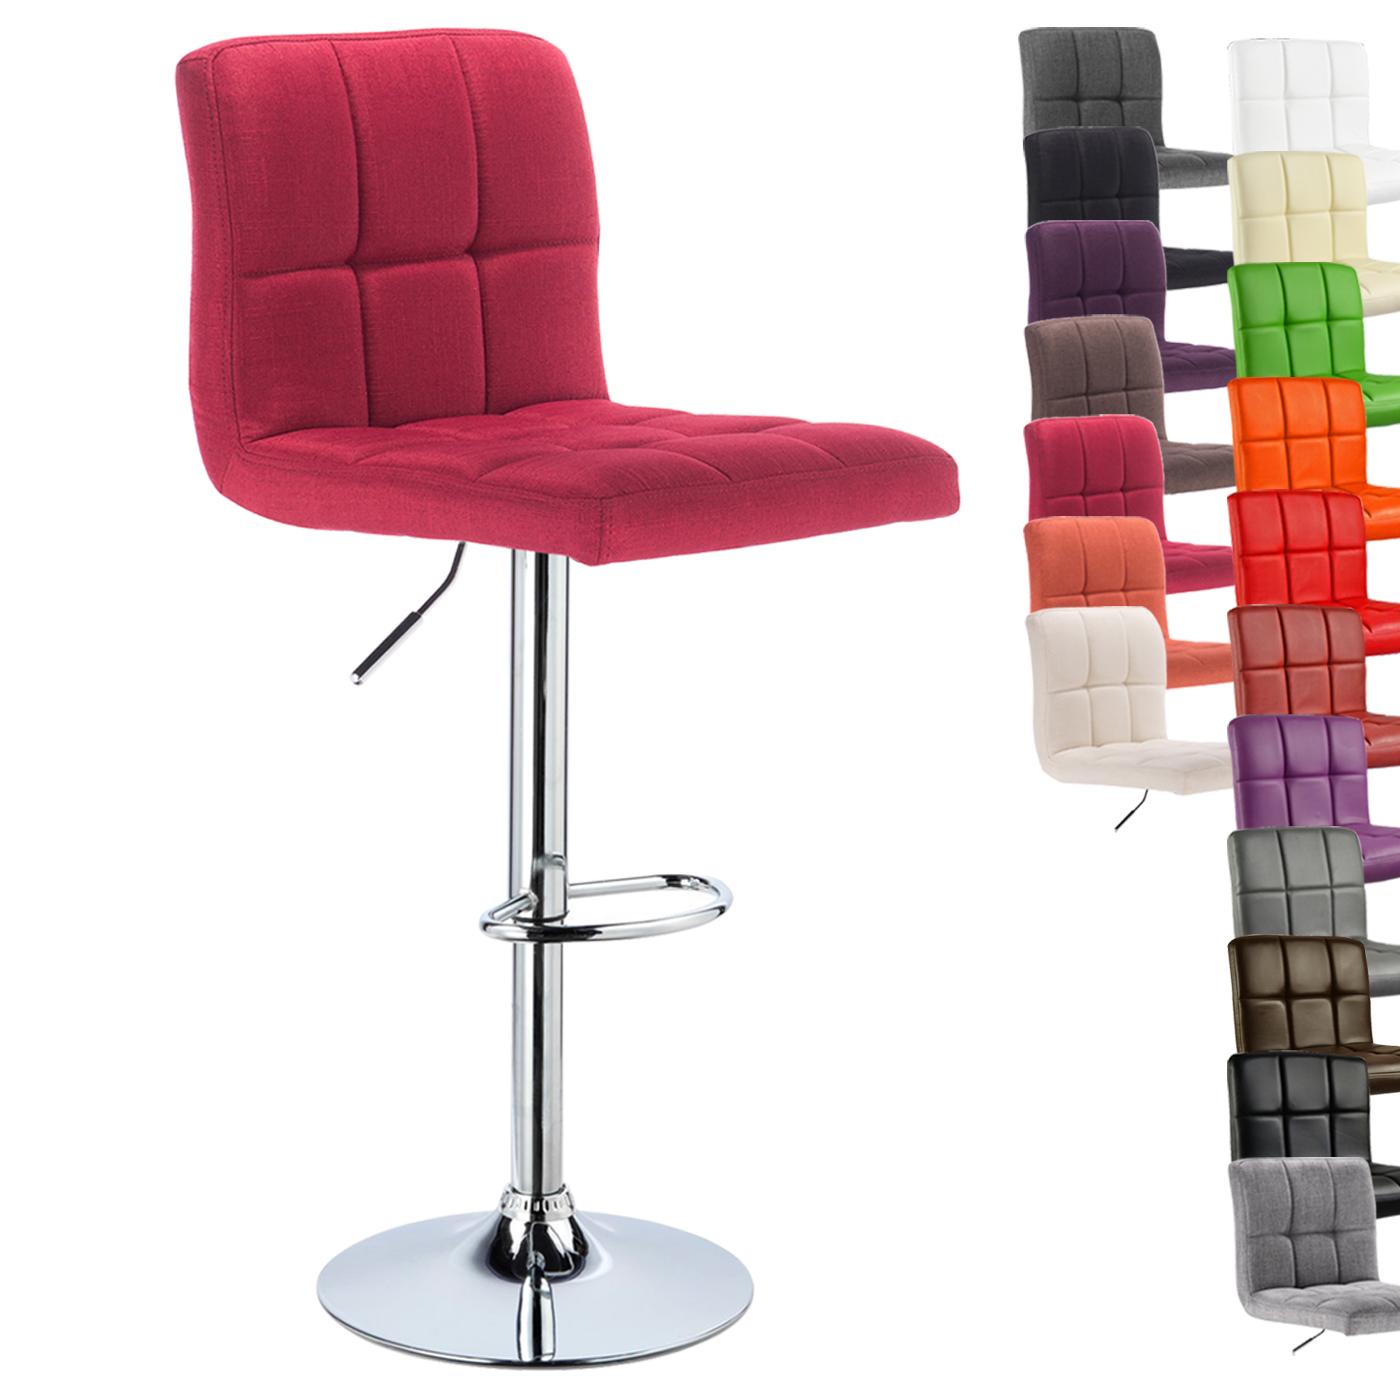 1 tabouret de bar r glable 360 rotation cuisine chaise en. Black Bedroom Furniture Sets. Home Design Ideas